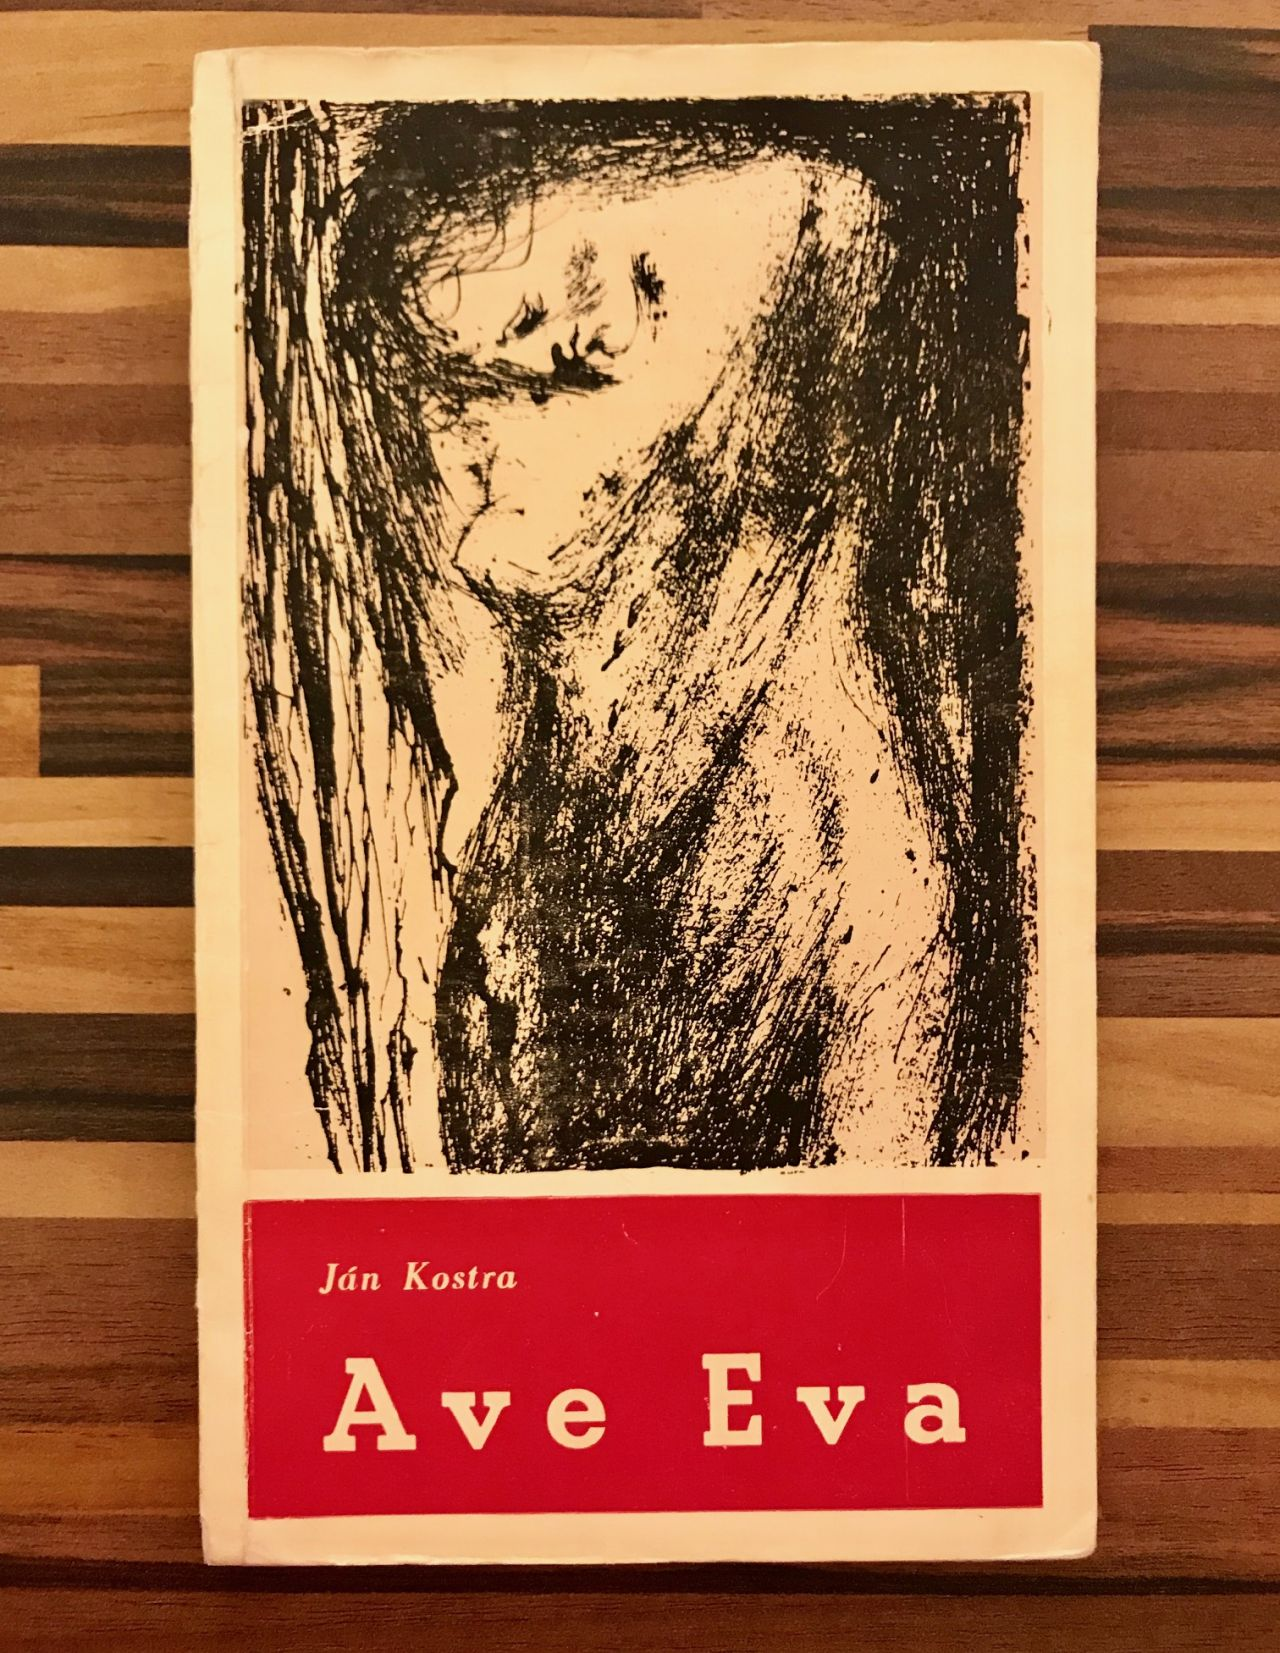 dde9c43de Ave Eva - Poézia - Antikvariat Steiner